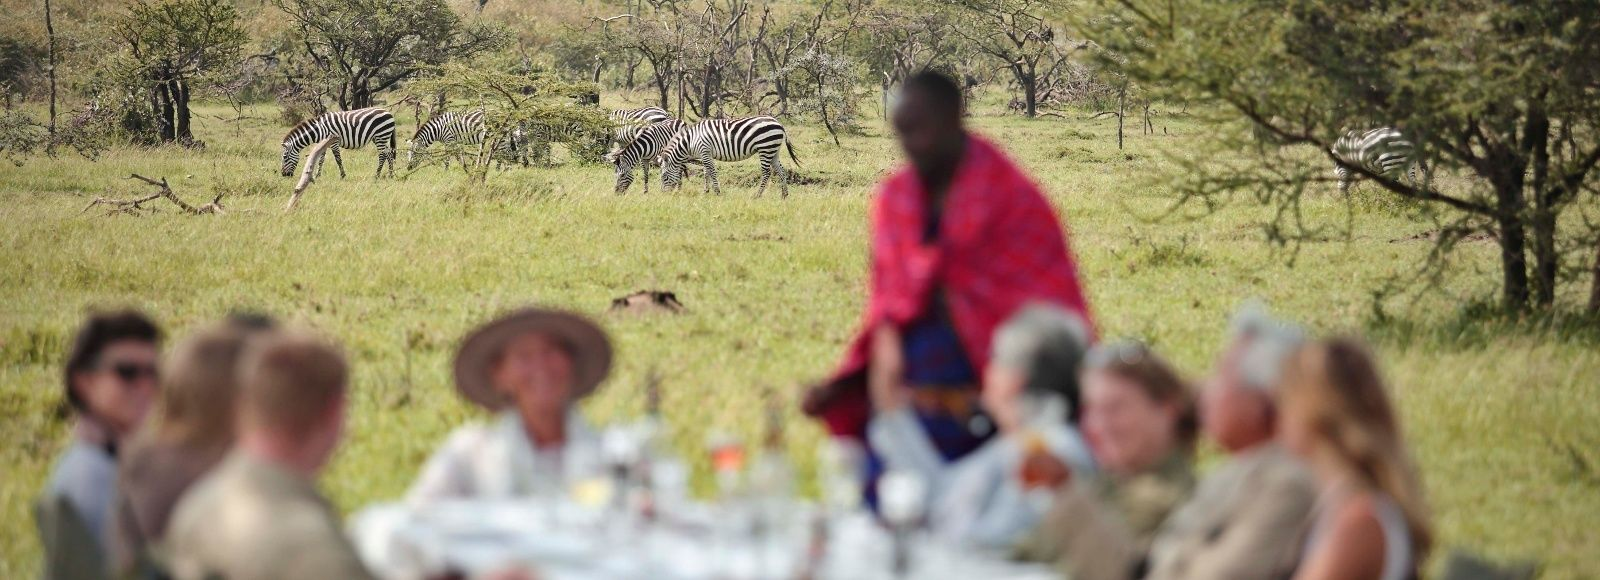 Kenia: Masai Mara, Wandersafaris & Traumstrände Urlaub 5